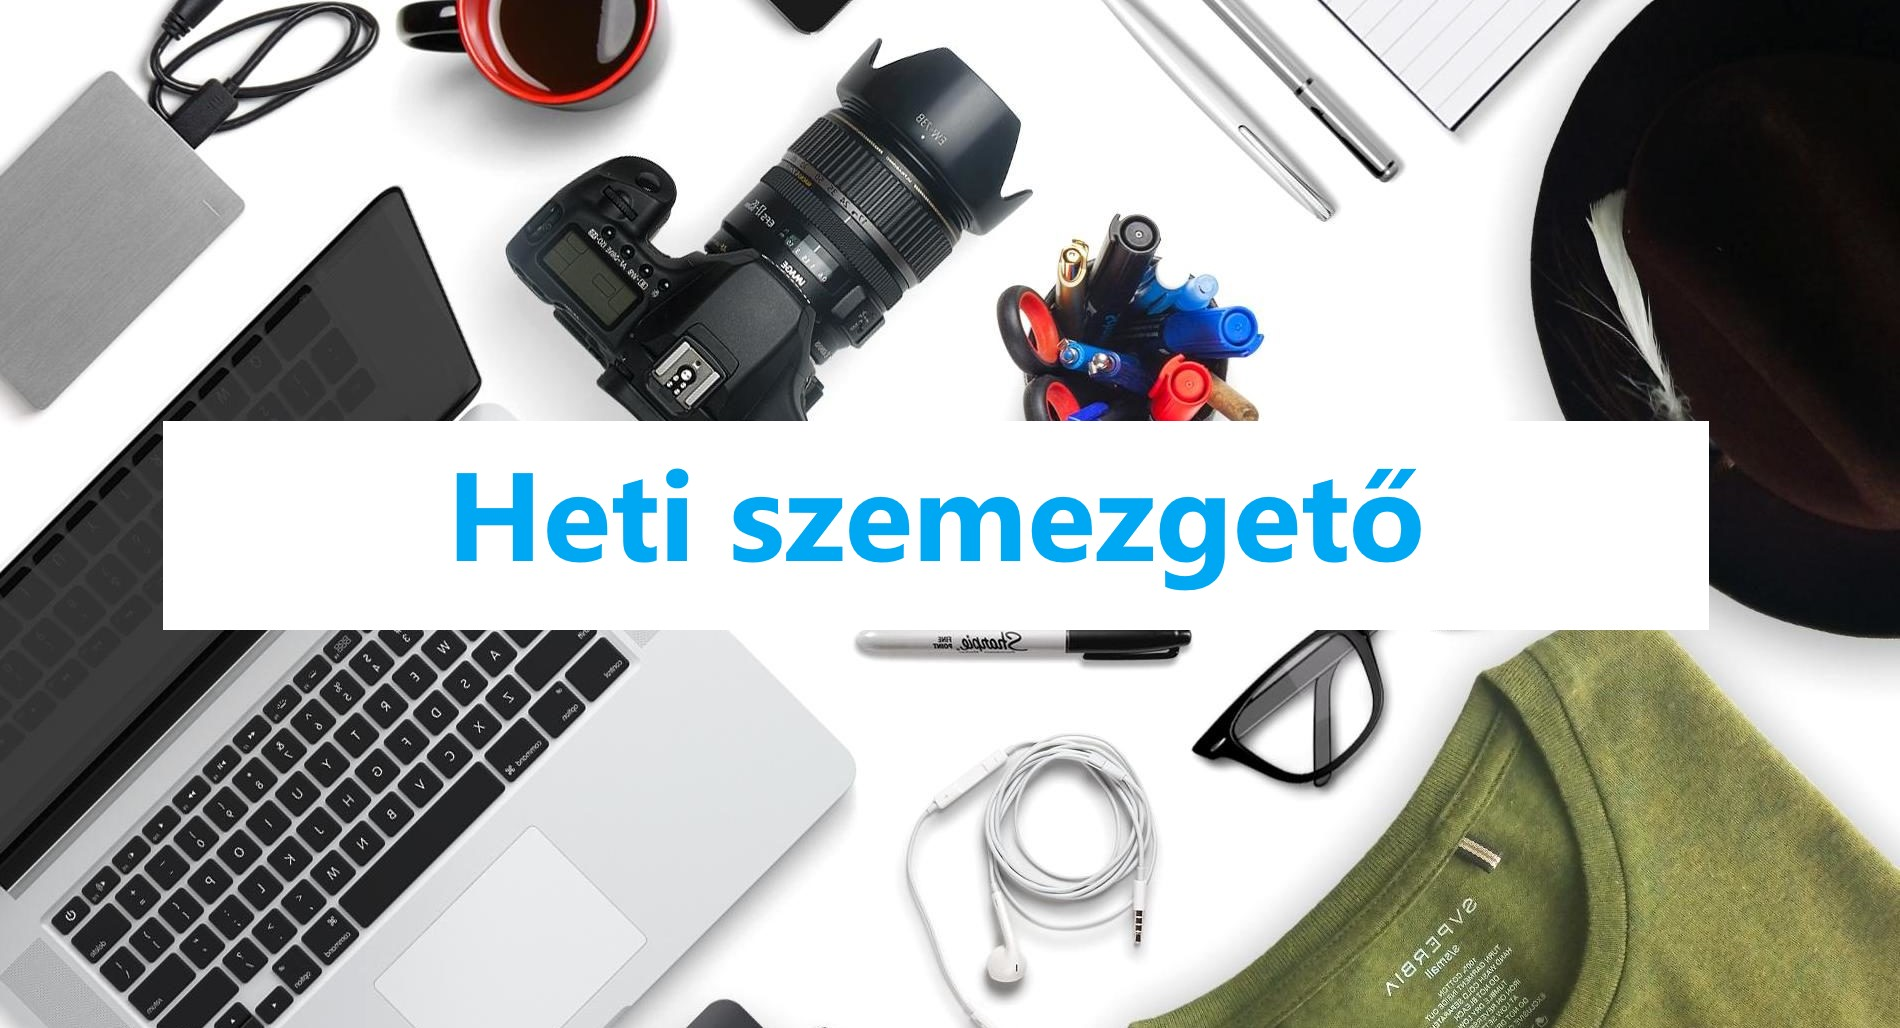 heti_szemezgeto_uj_15.jpg